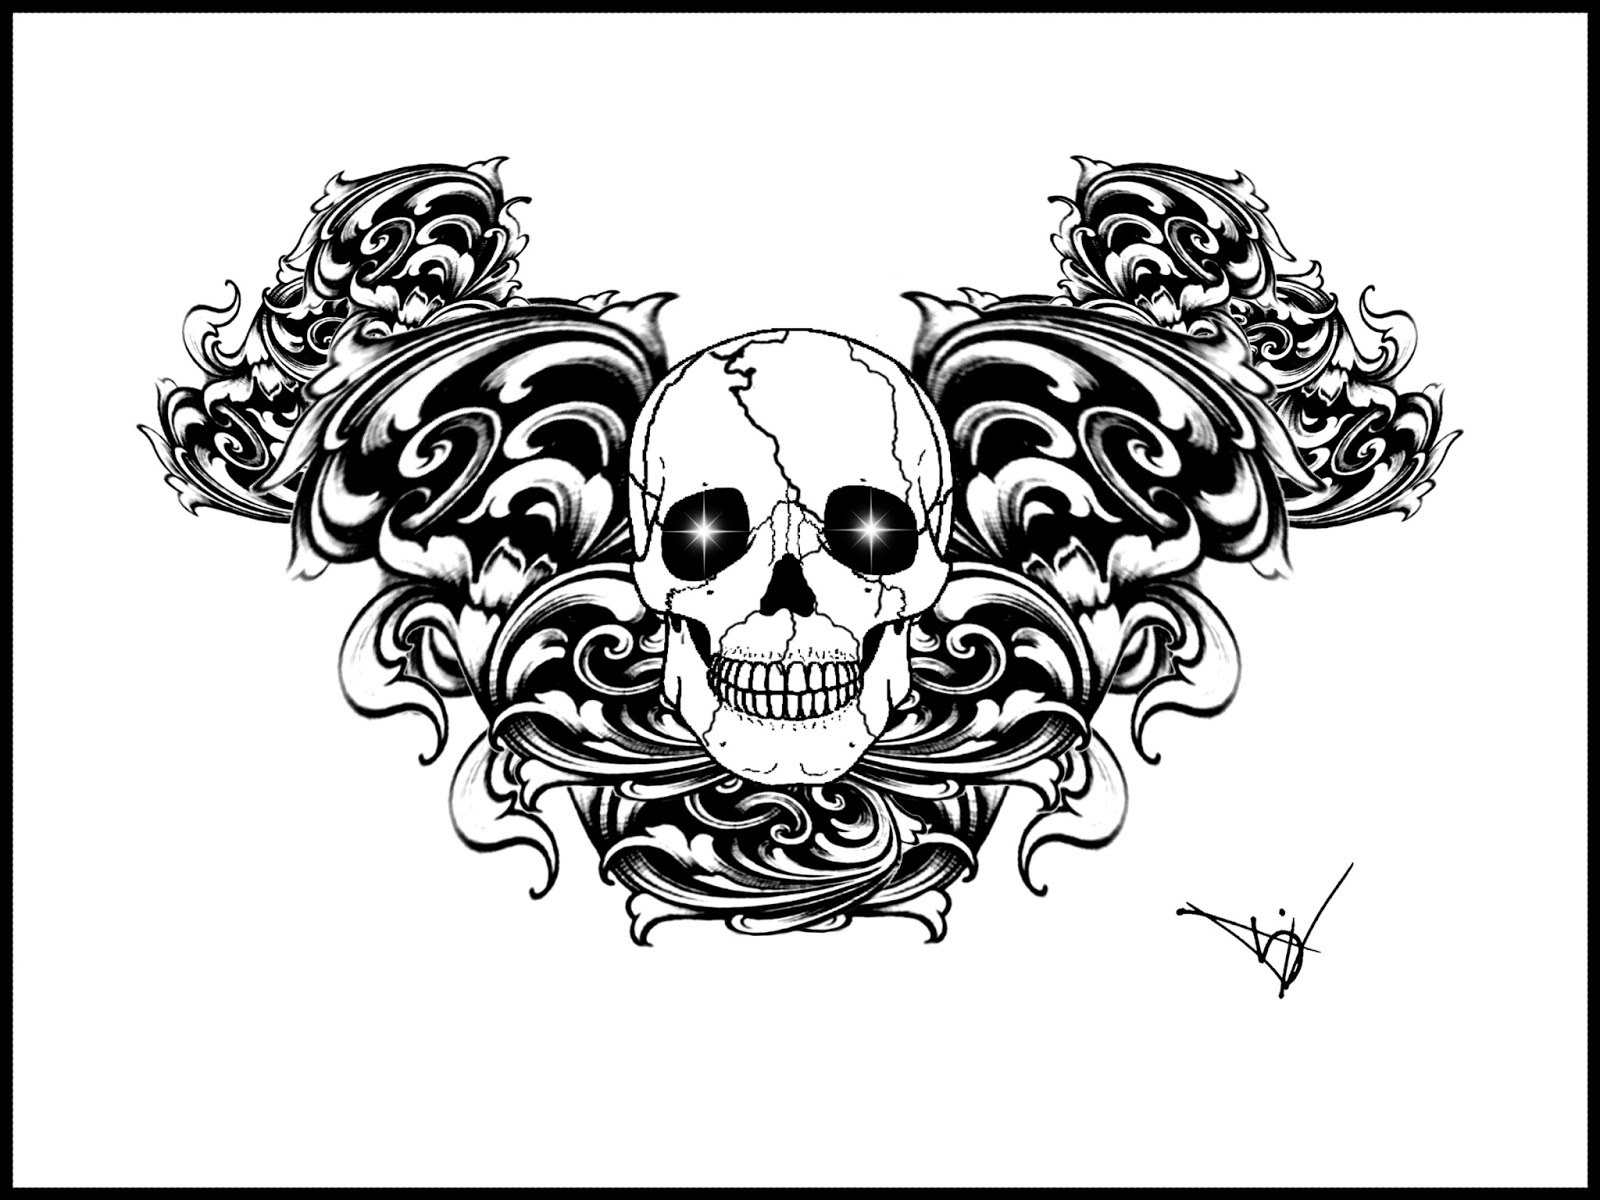 Gothic Heart Tattoos Gothic skull tattoo design